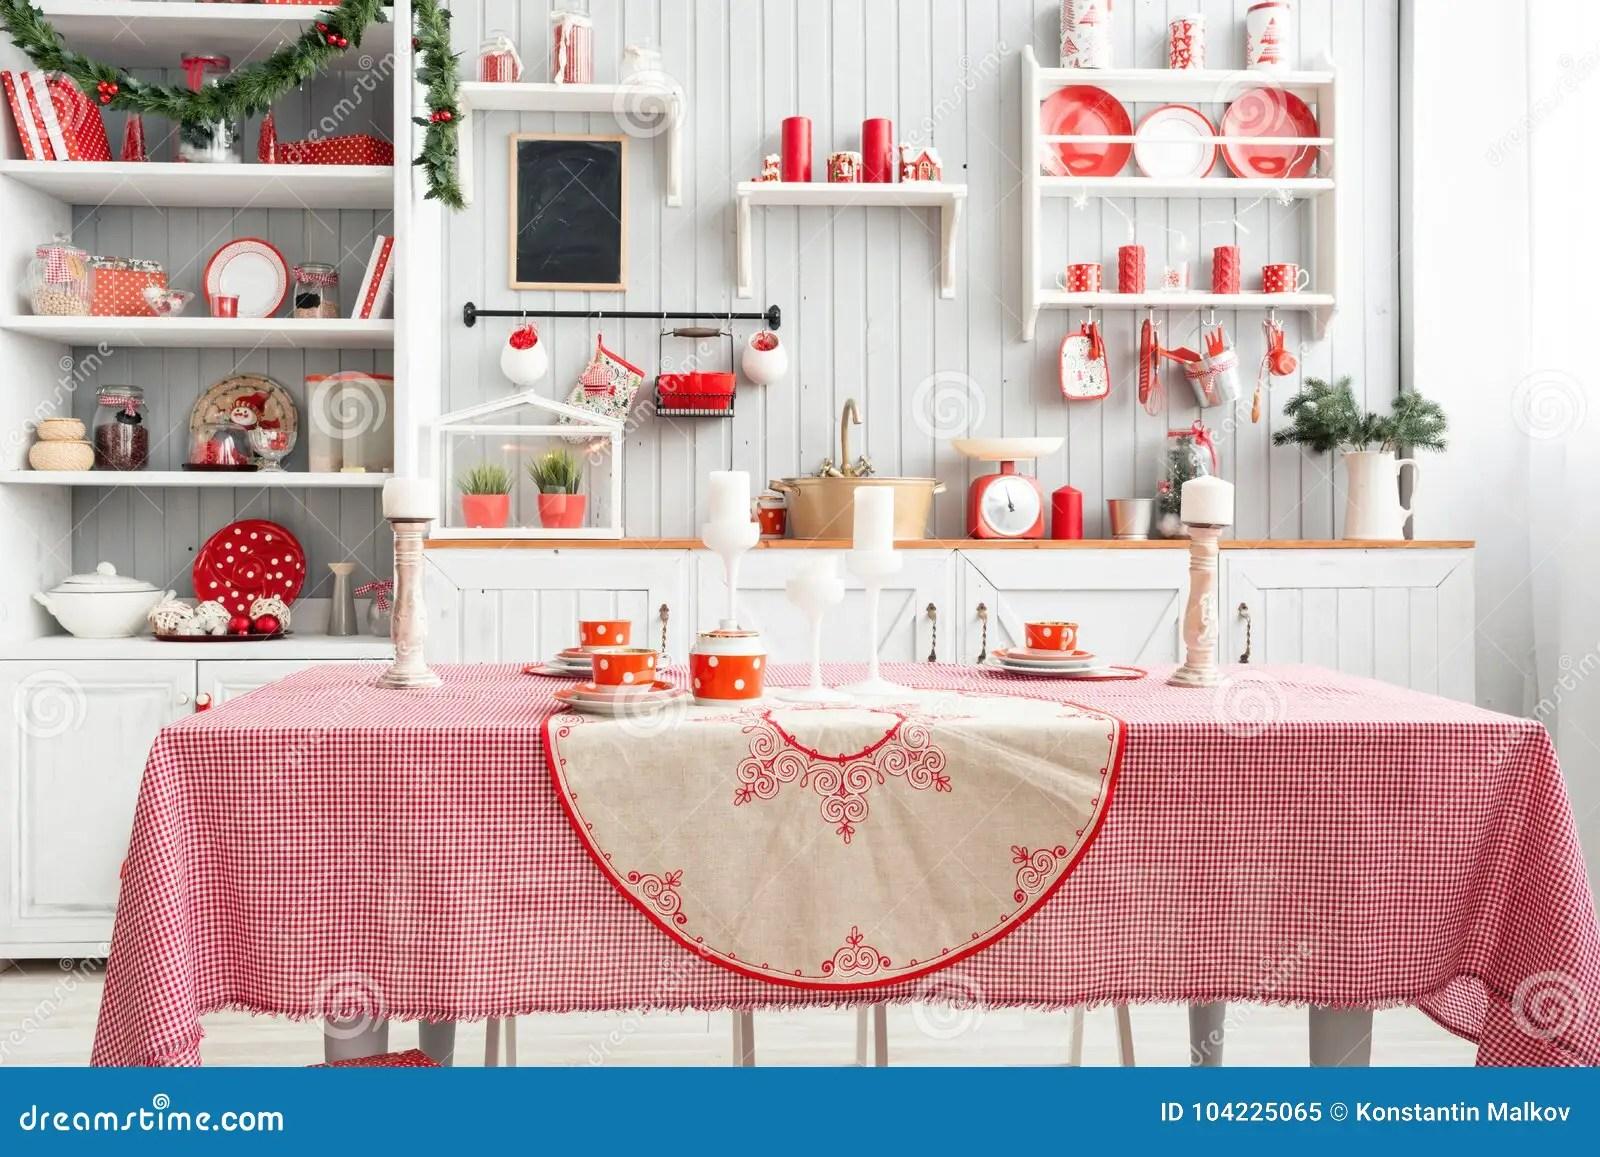 kitchen prep table mitts 内部浅灰色的厨房和红色圣诞节装饰在家准备午餐在厨房概念在桌上的焦点和 内部浅灰色的厨房和红色圣诞节装饰在家准备午餐在厨房概念